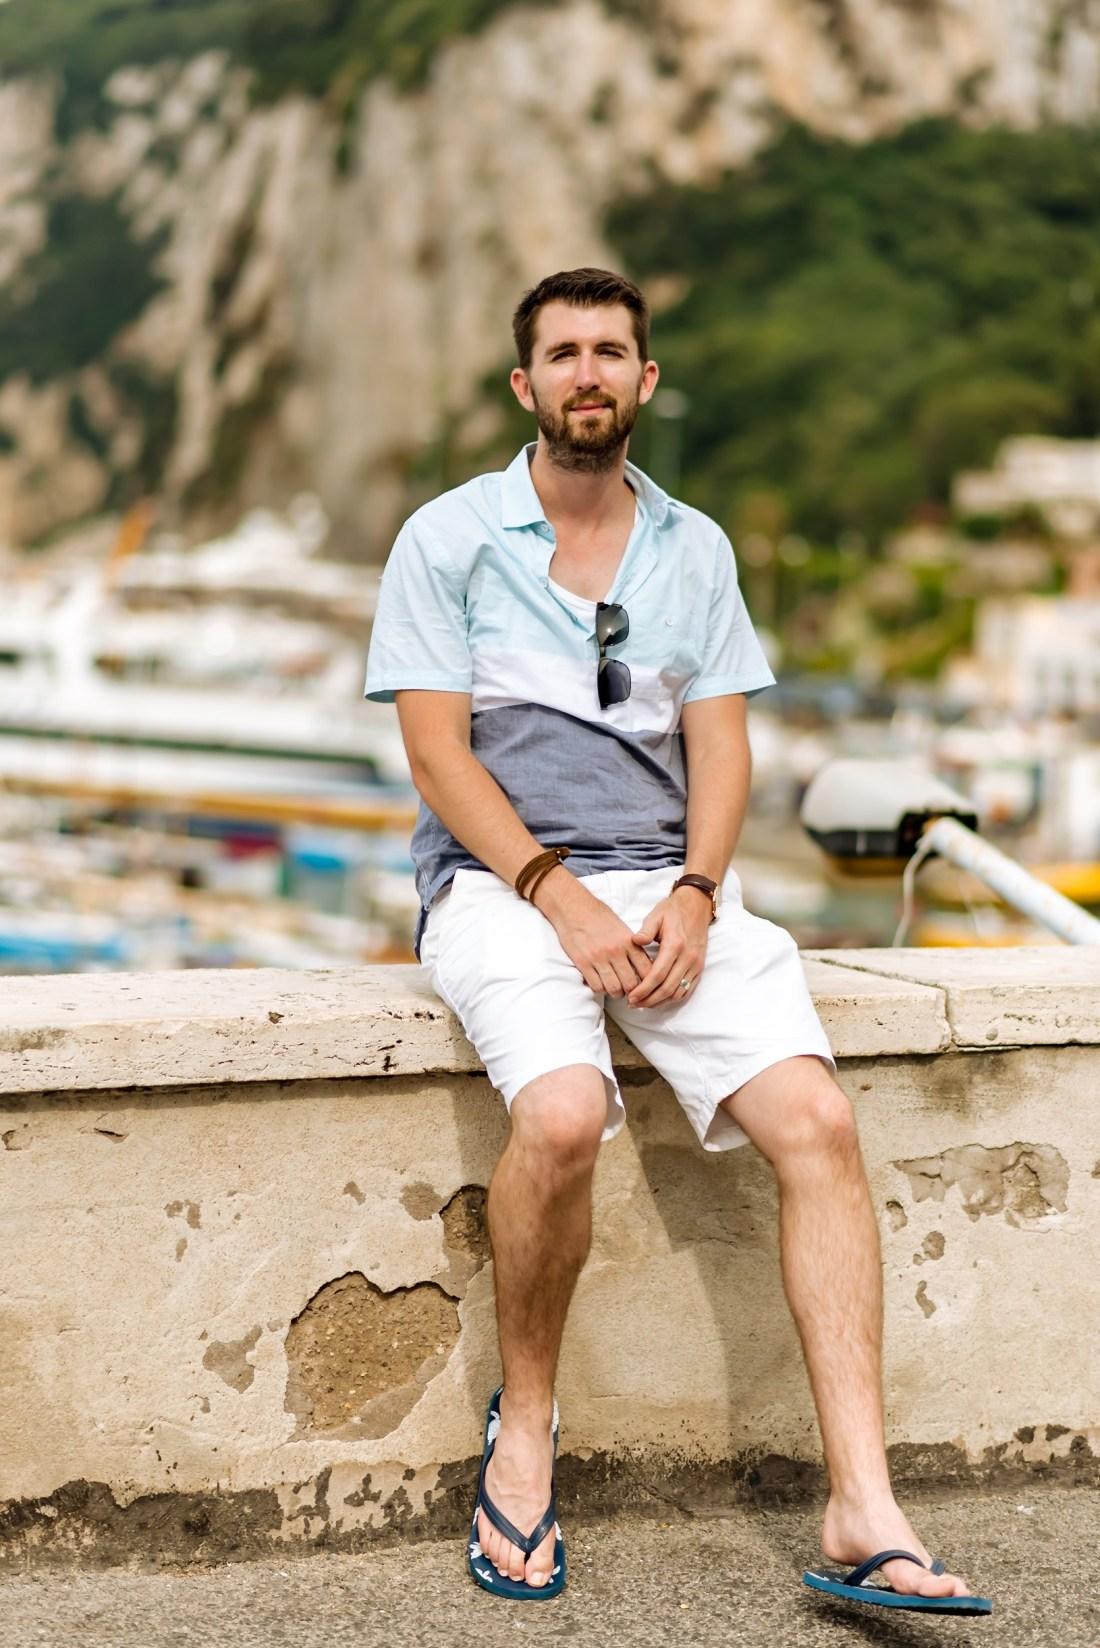 Express Fashion for Men Capri Italy Fancy Things Honeymoon